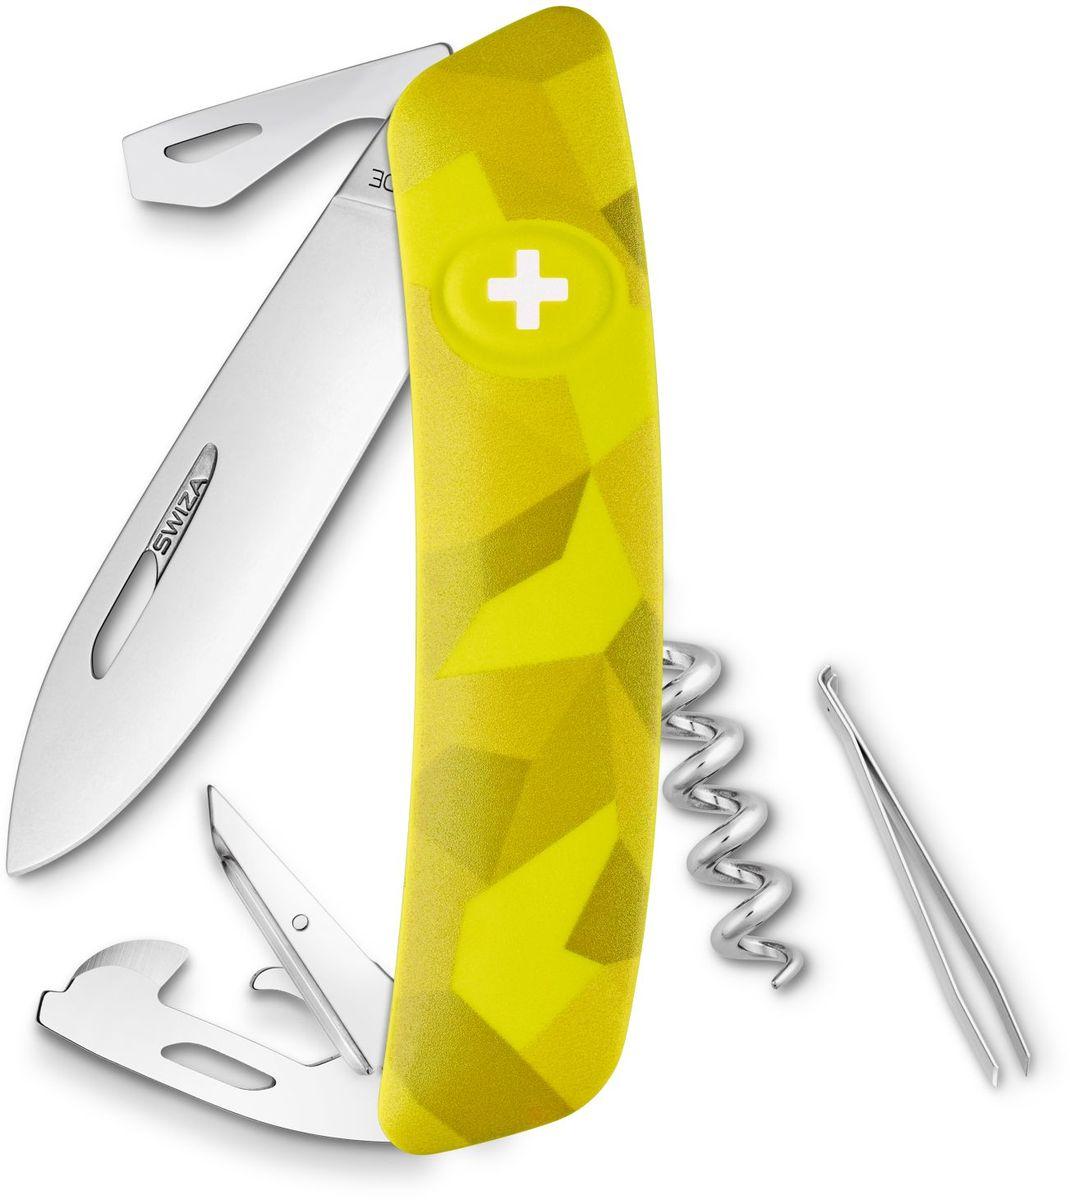 Нож швейцарский SWIZA С03, цвет: желтый, длина клинка 7,5 см